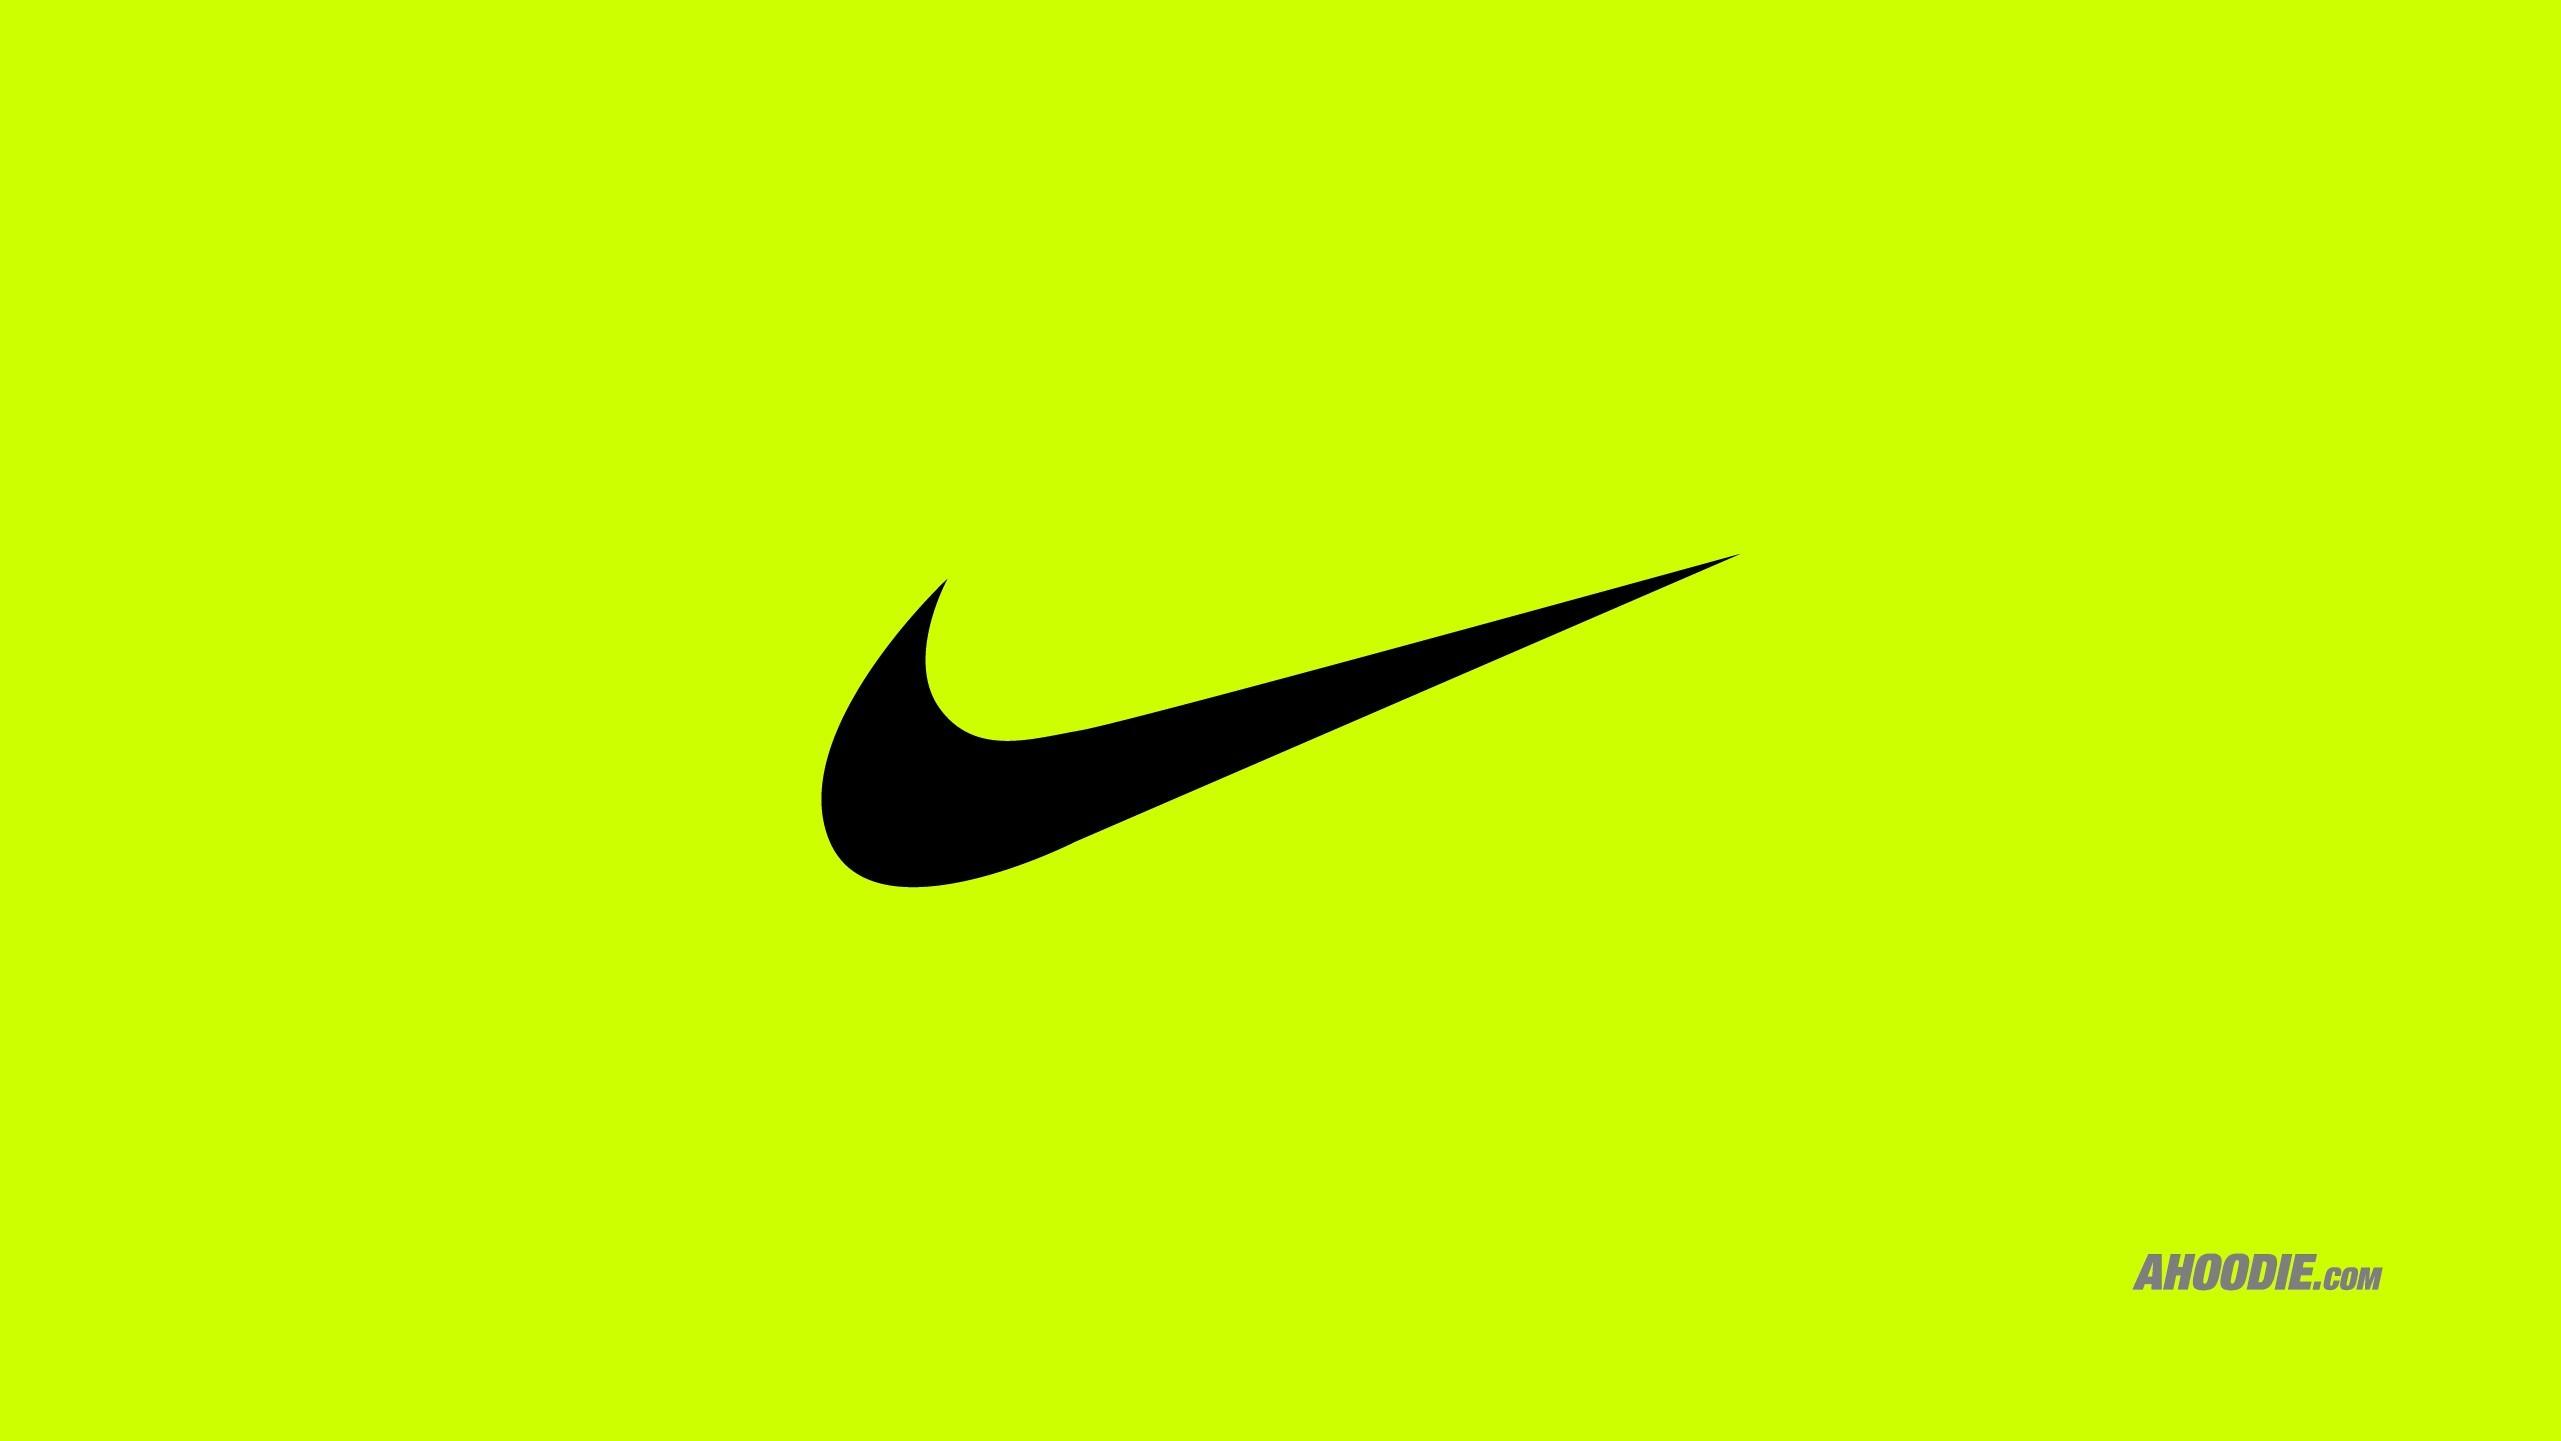 Res: 2561x1441, Nike swoosh Nike swoosh Nike swoosh